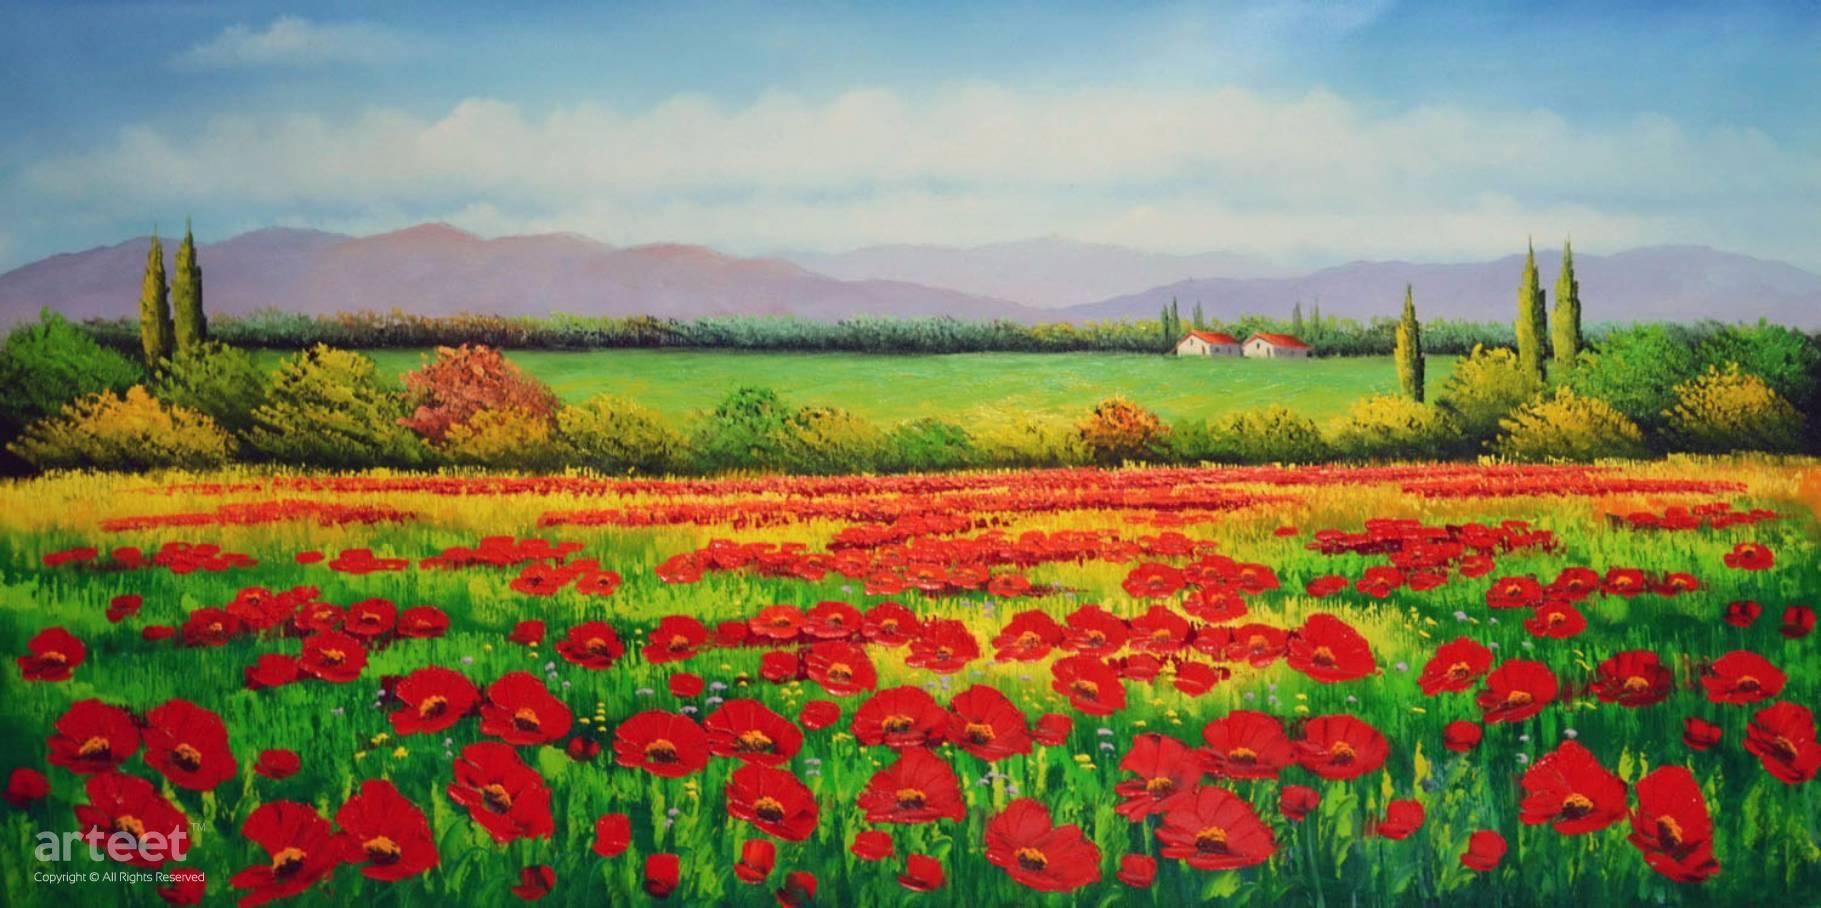 Red Poppies Flower Field Art Paintings For Sale Online Gallery